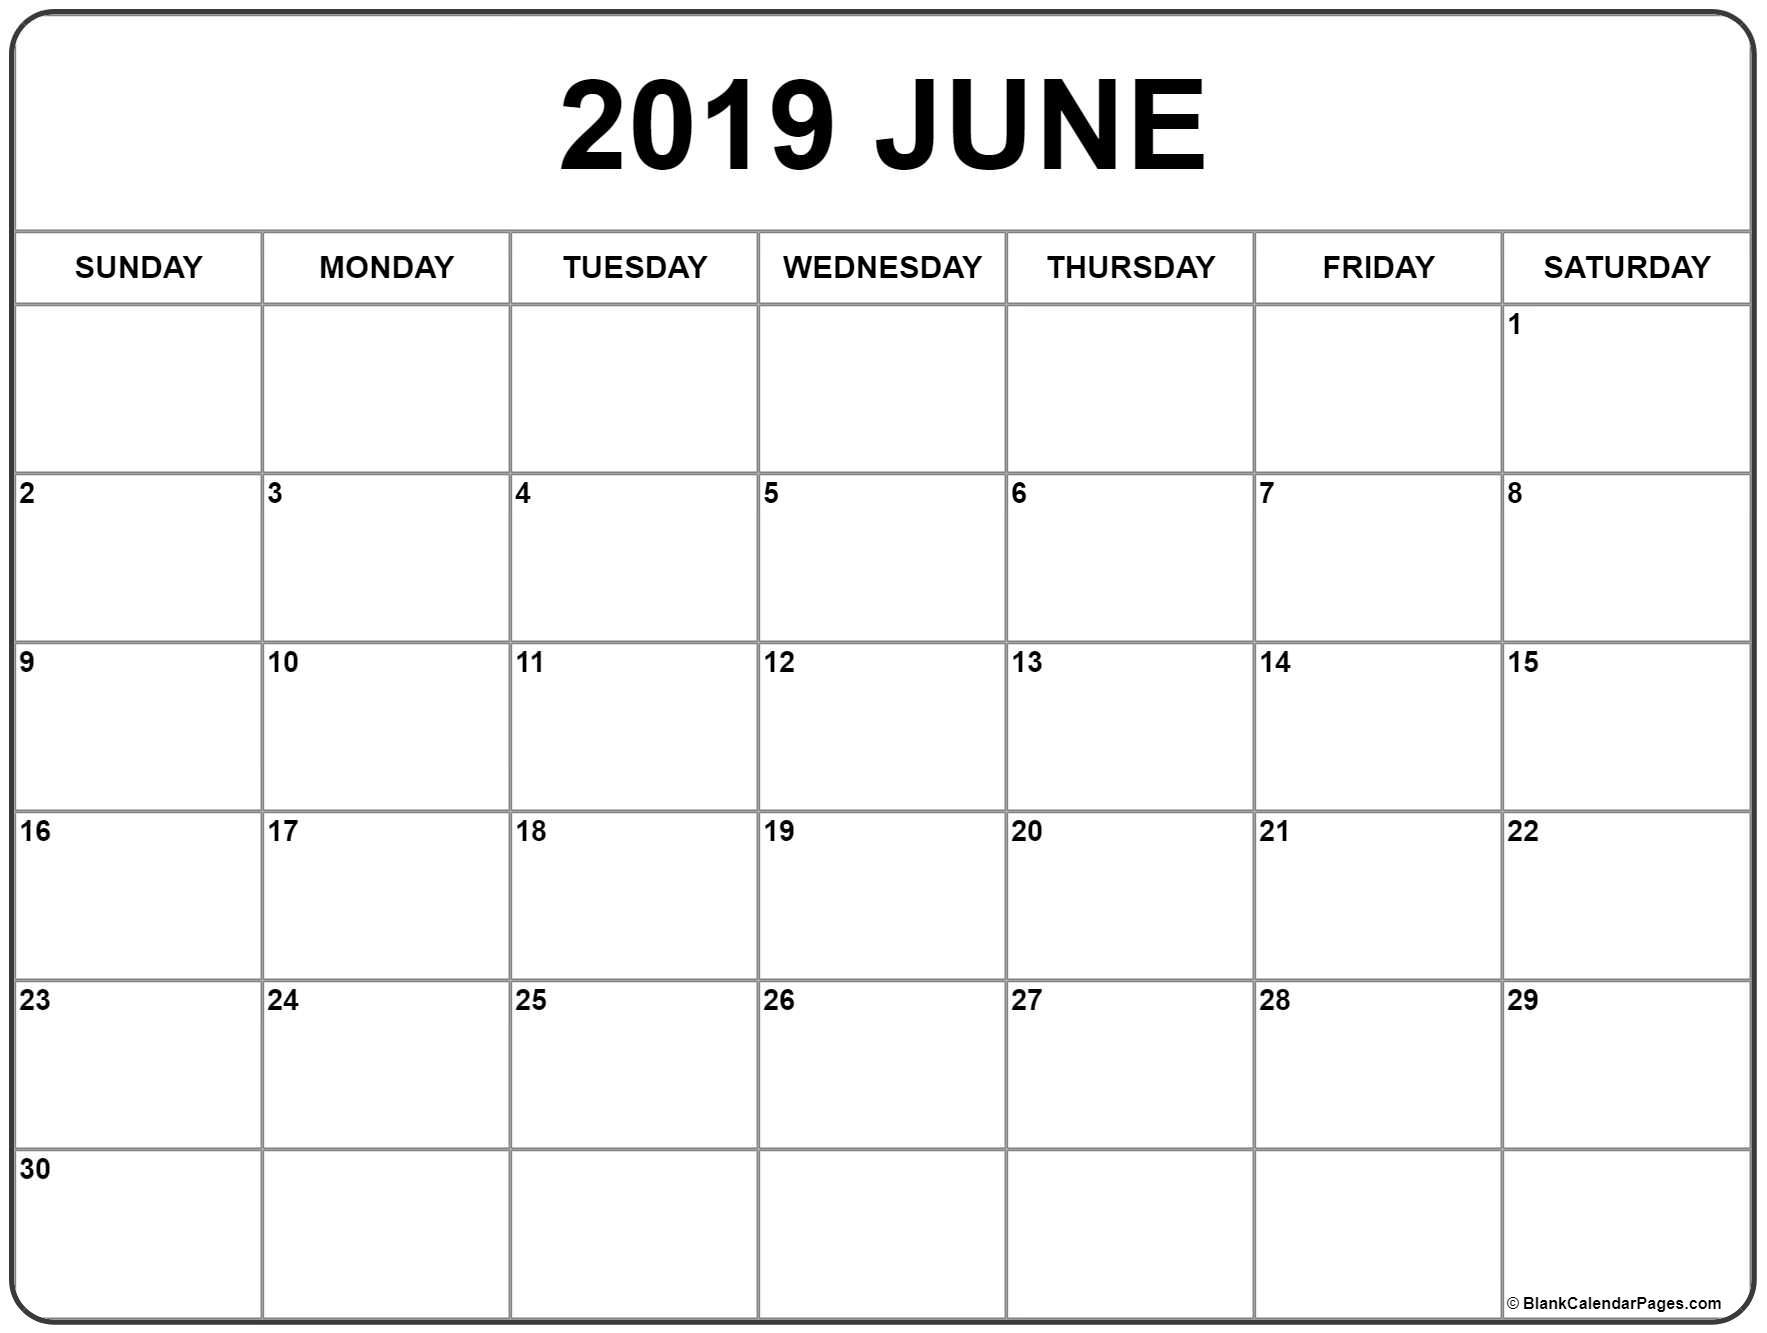 Calendar Of June 2019 | Template Calendar Printable regarding Ramadan Fasting Calendar Millville Nj